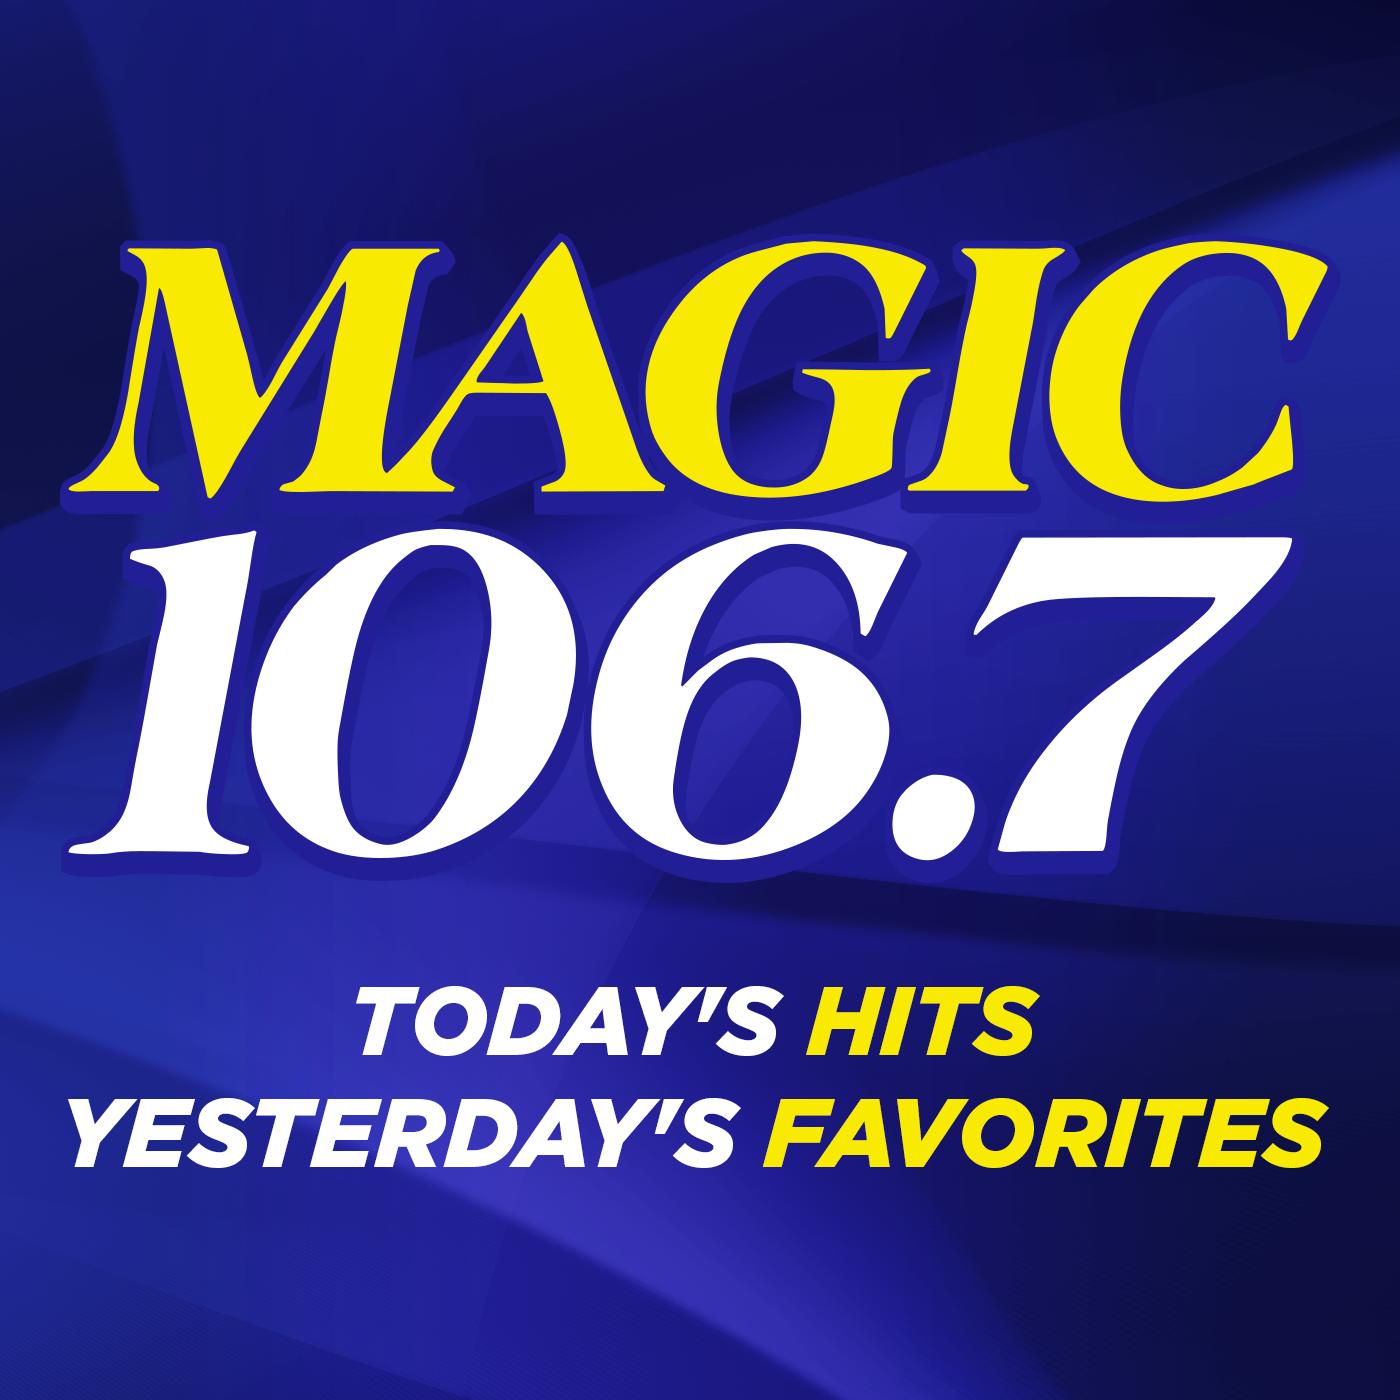 MAGIC 106.7 HD-2